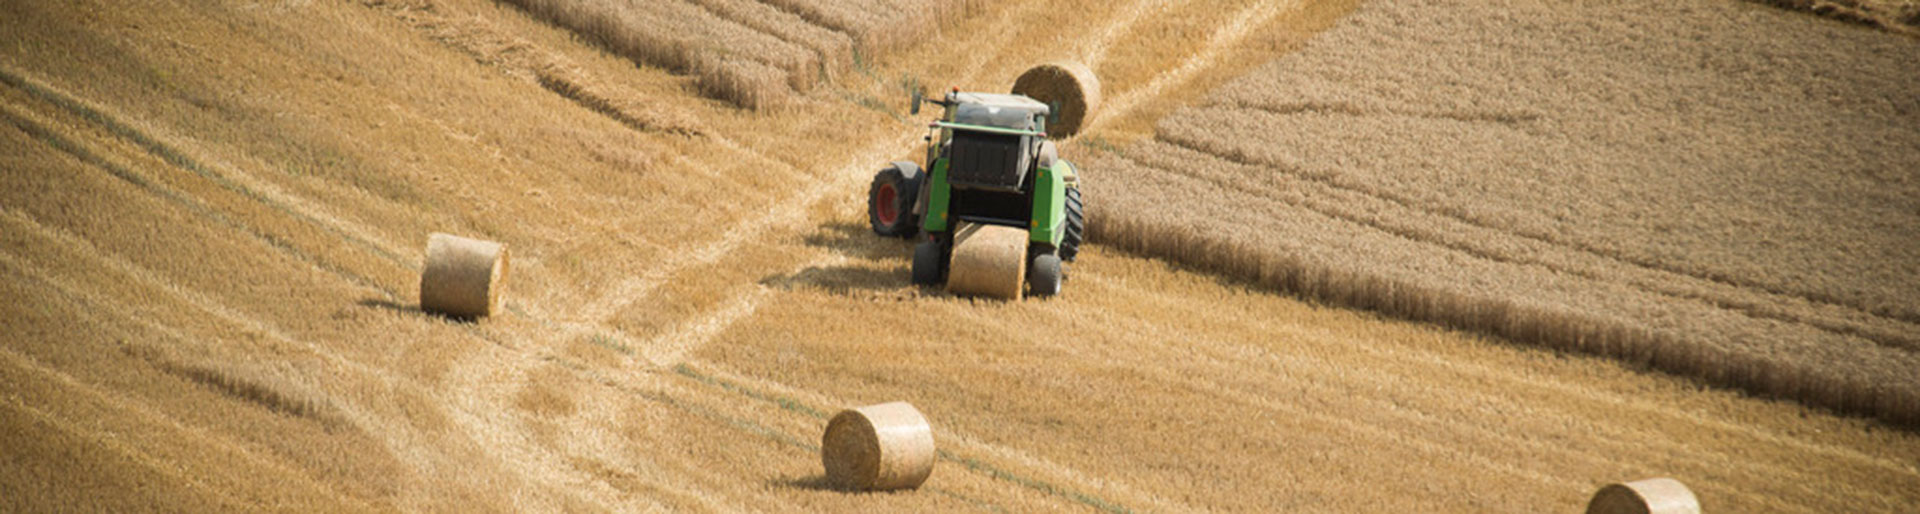 CAPa MA - Tracteur dans un champ